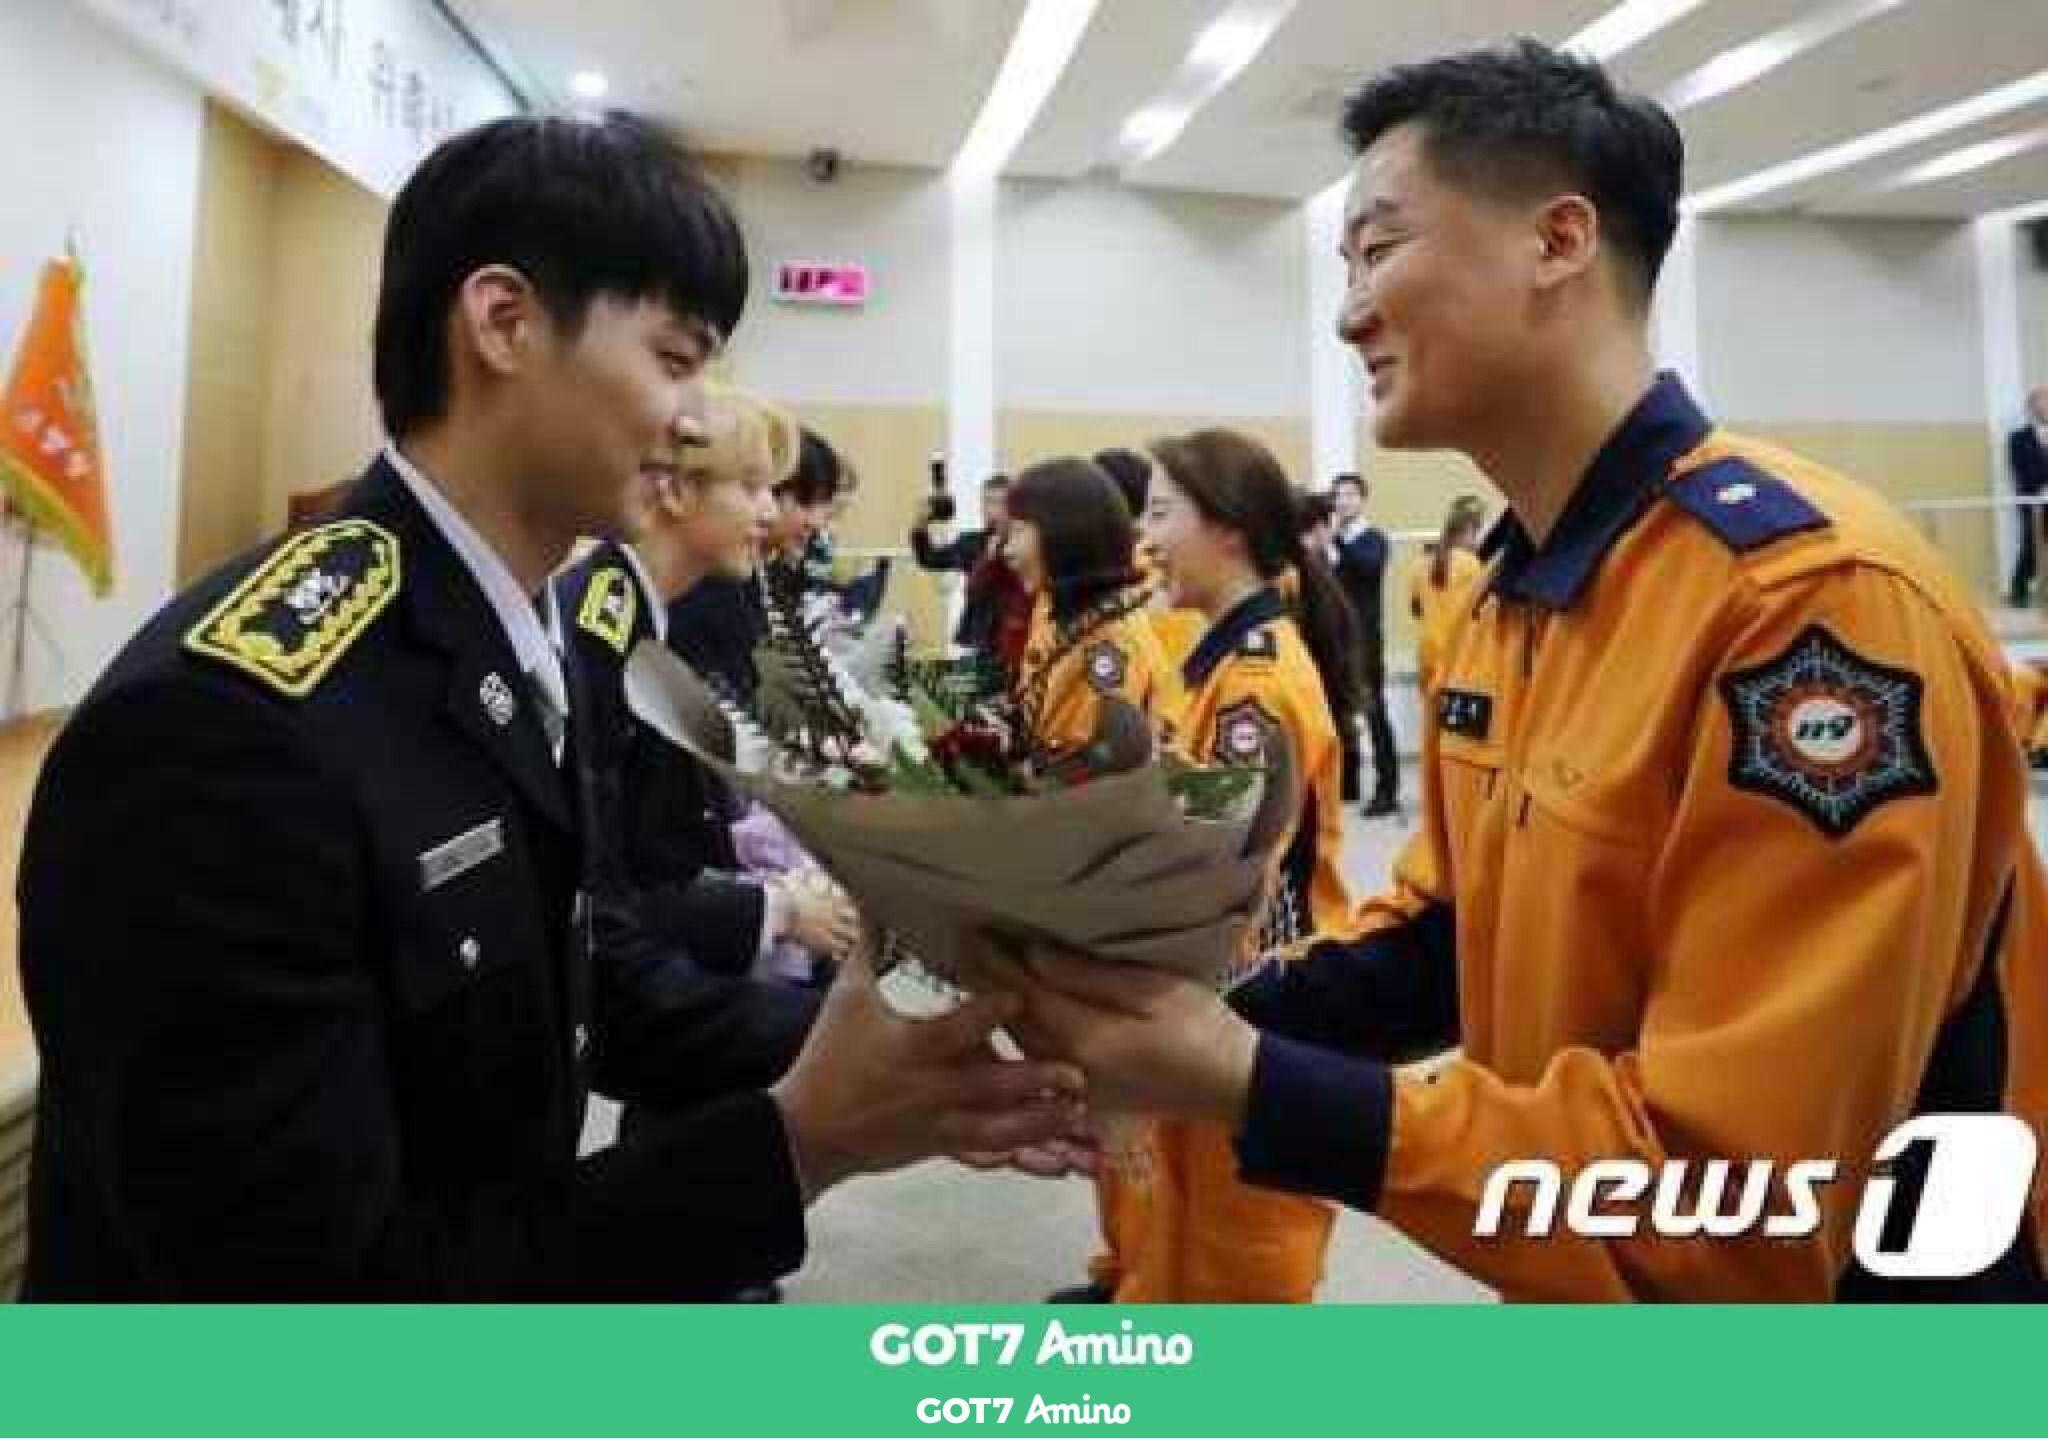 Pin by kim on Jb in 2020 Got7, Ambassador, Firefighter